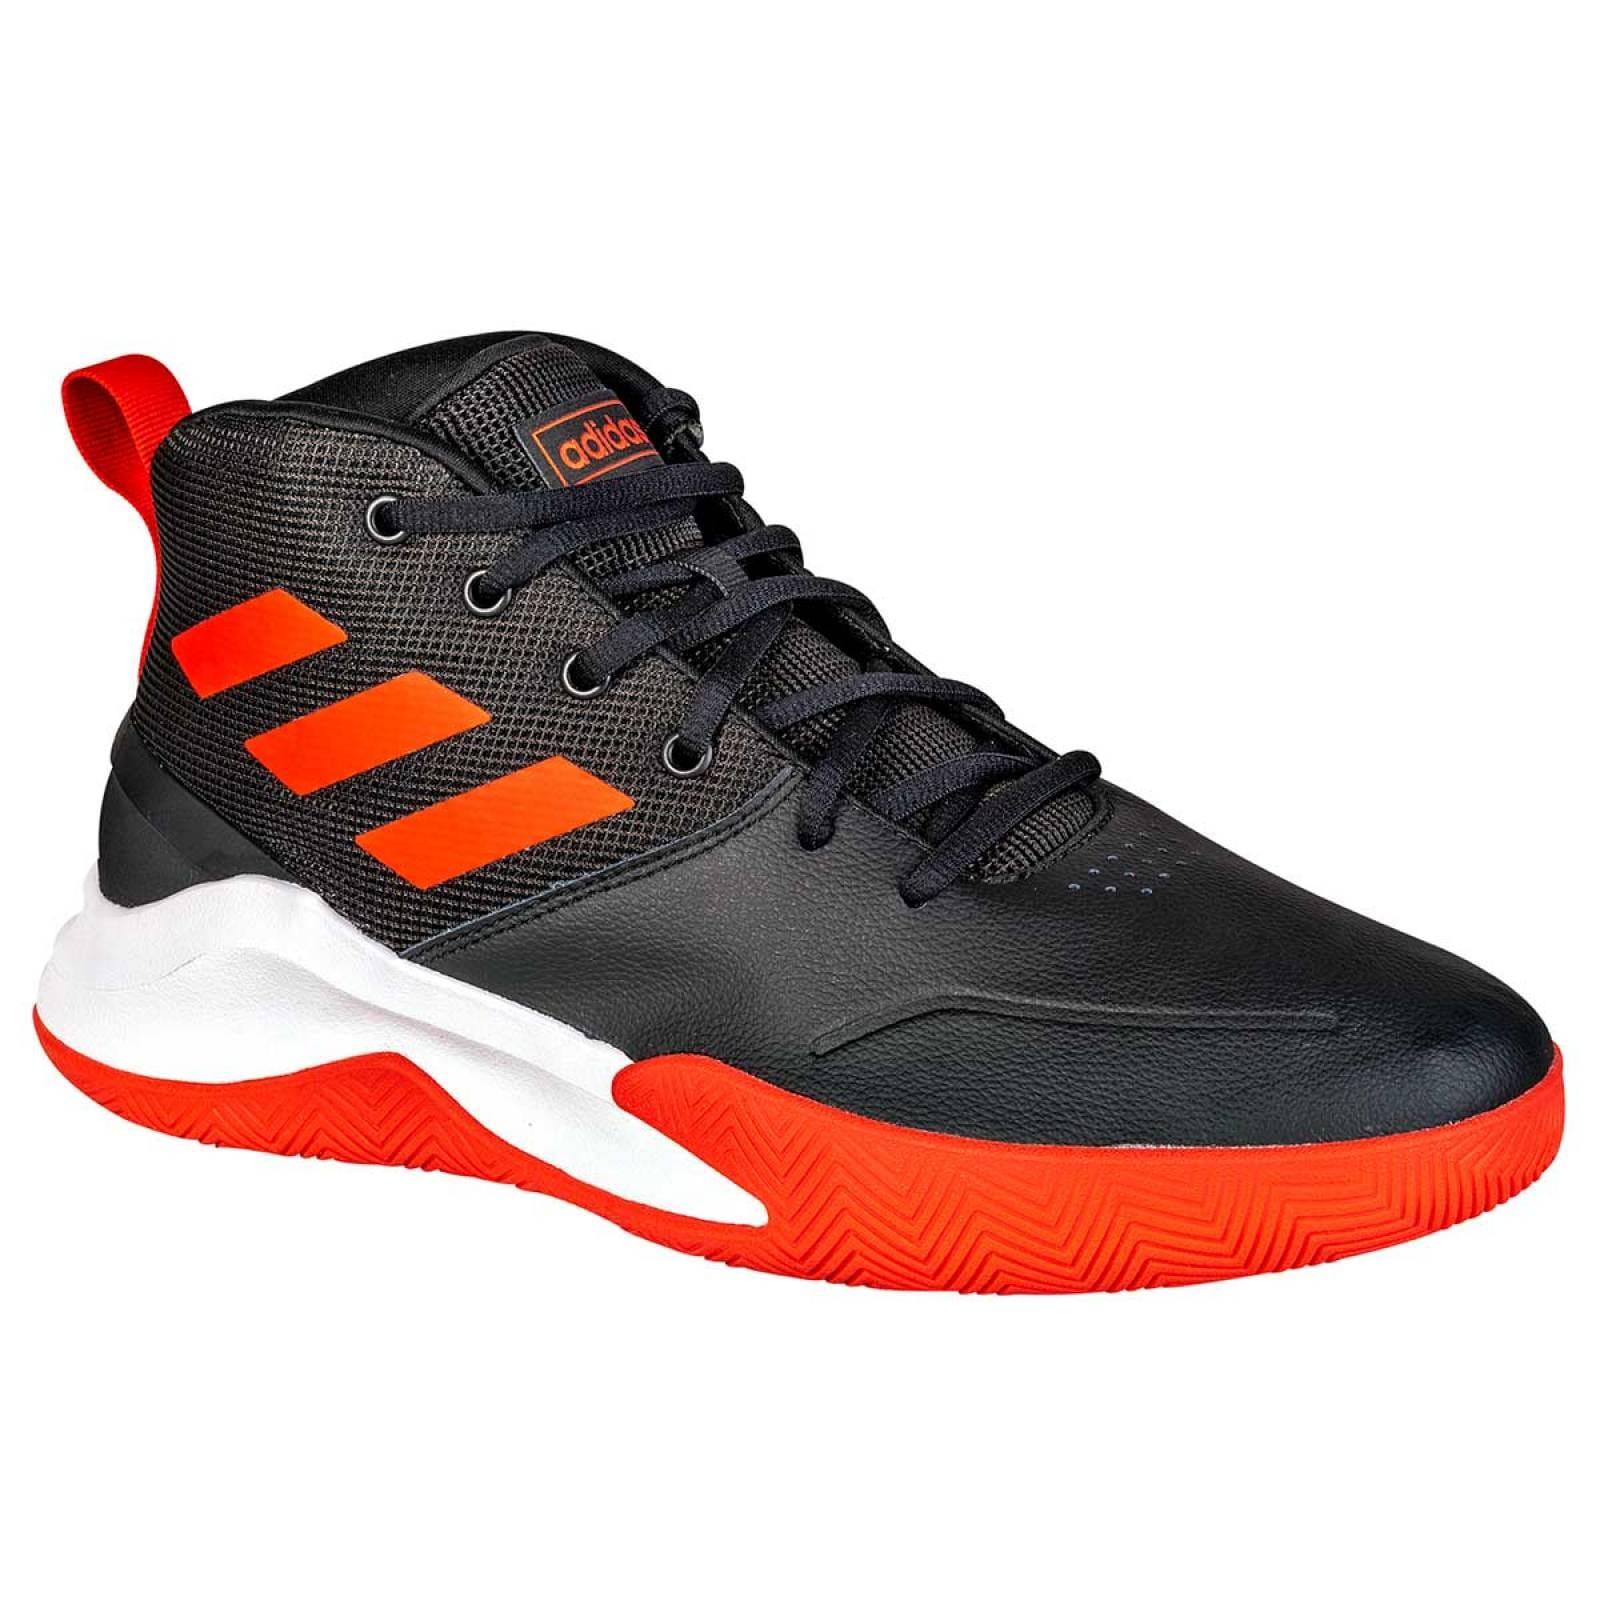 Adidas Tenis Hombre Negro rojo